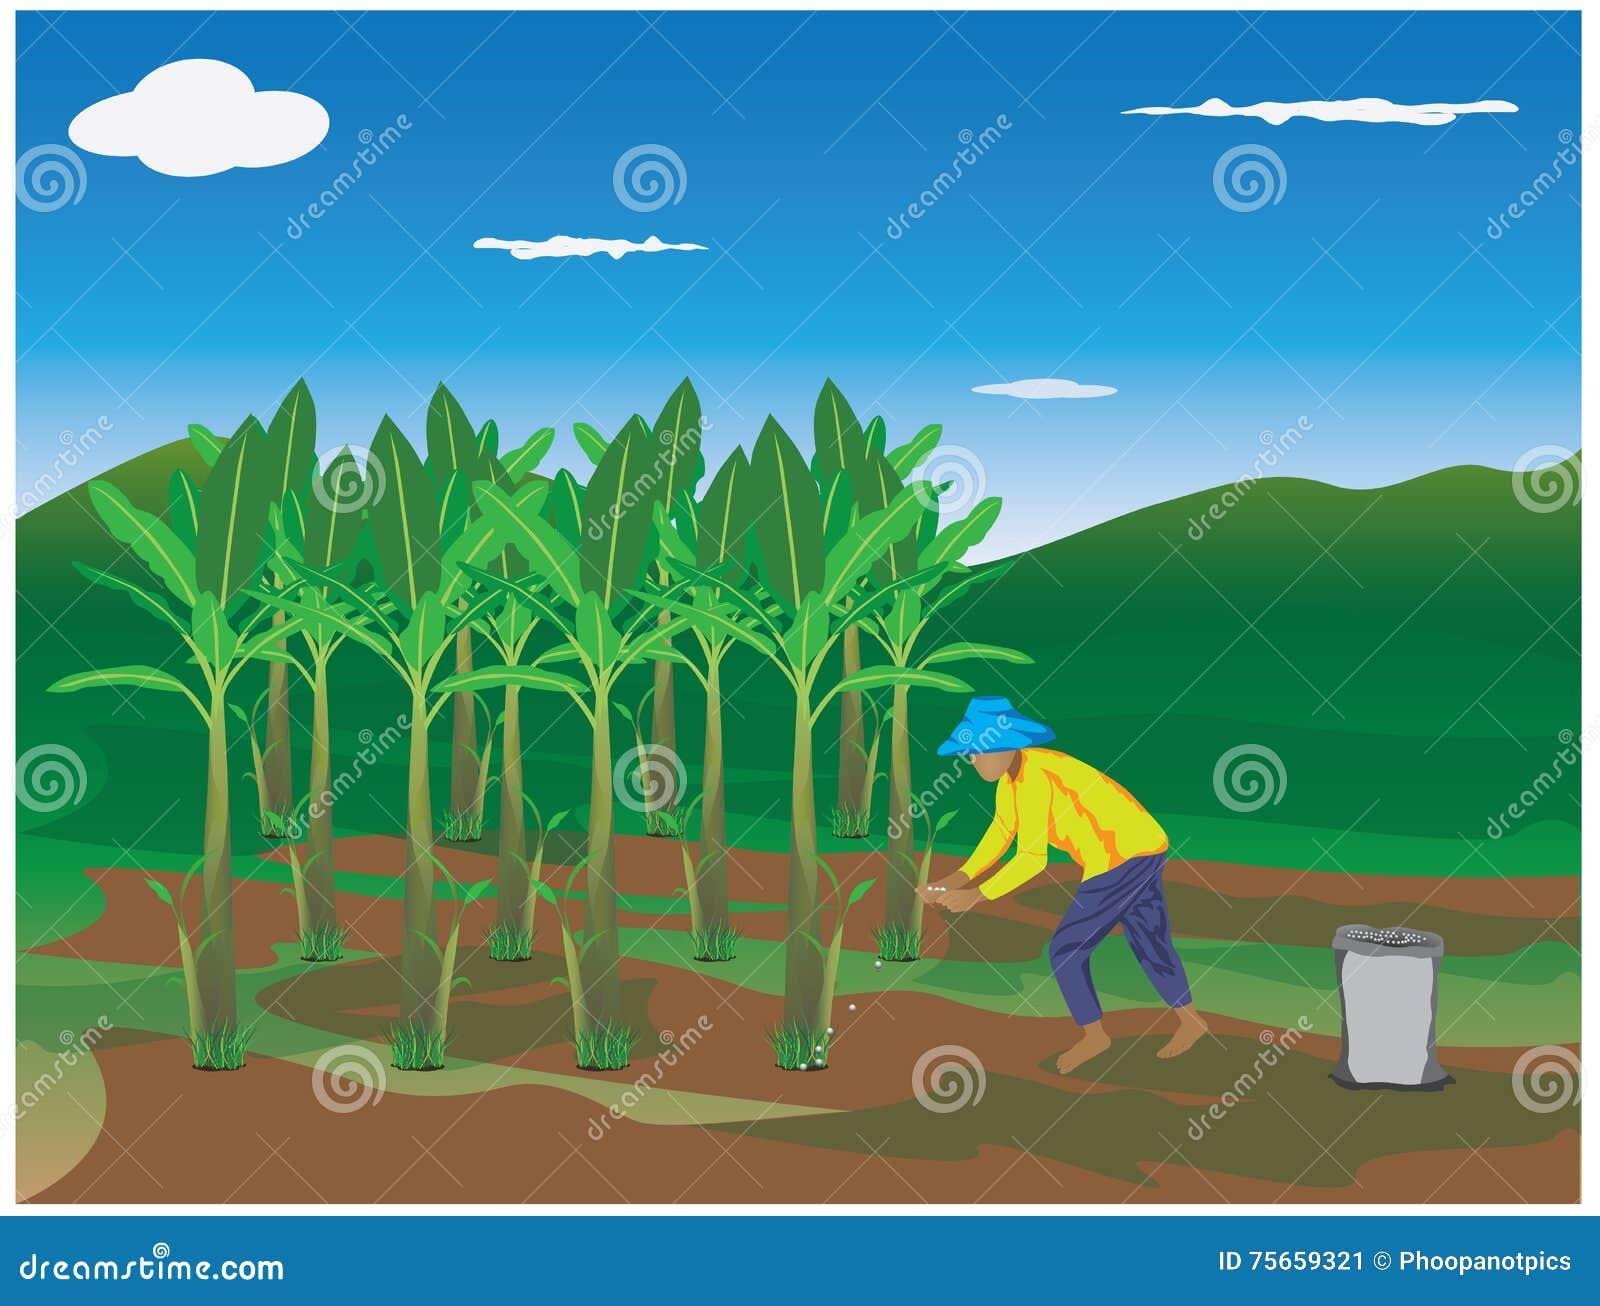 bananier d 39 engrais d 39 agronome illustration stock illustration du fermier mine 75659321. Black Bedroom Furniture Sets. Home Design Ideas